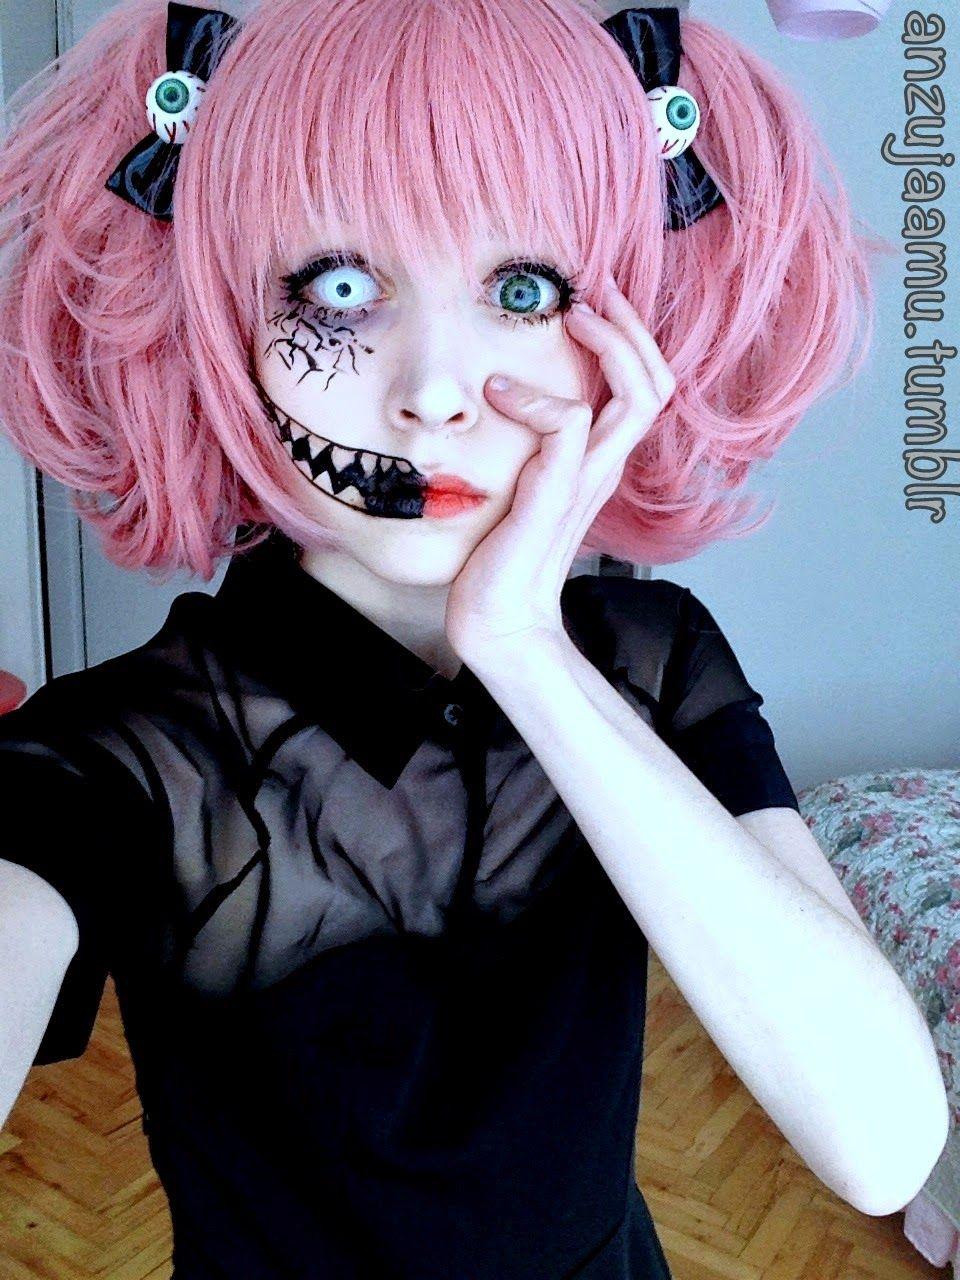 Cute Halloween Makeup and Wig | Pastel goth makeup, Cute ...